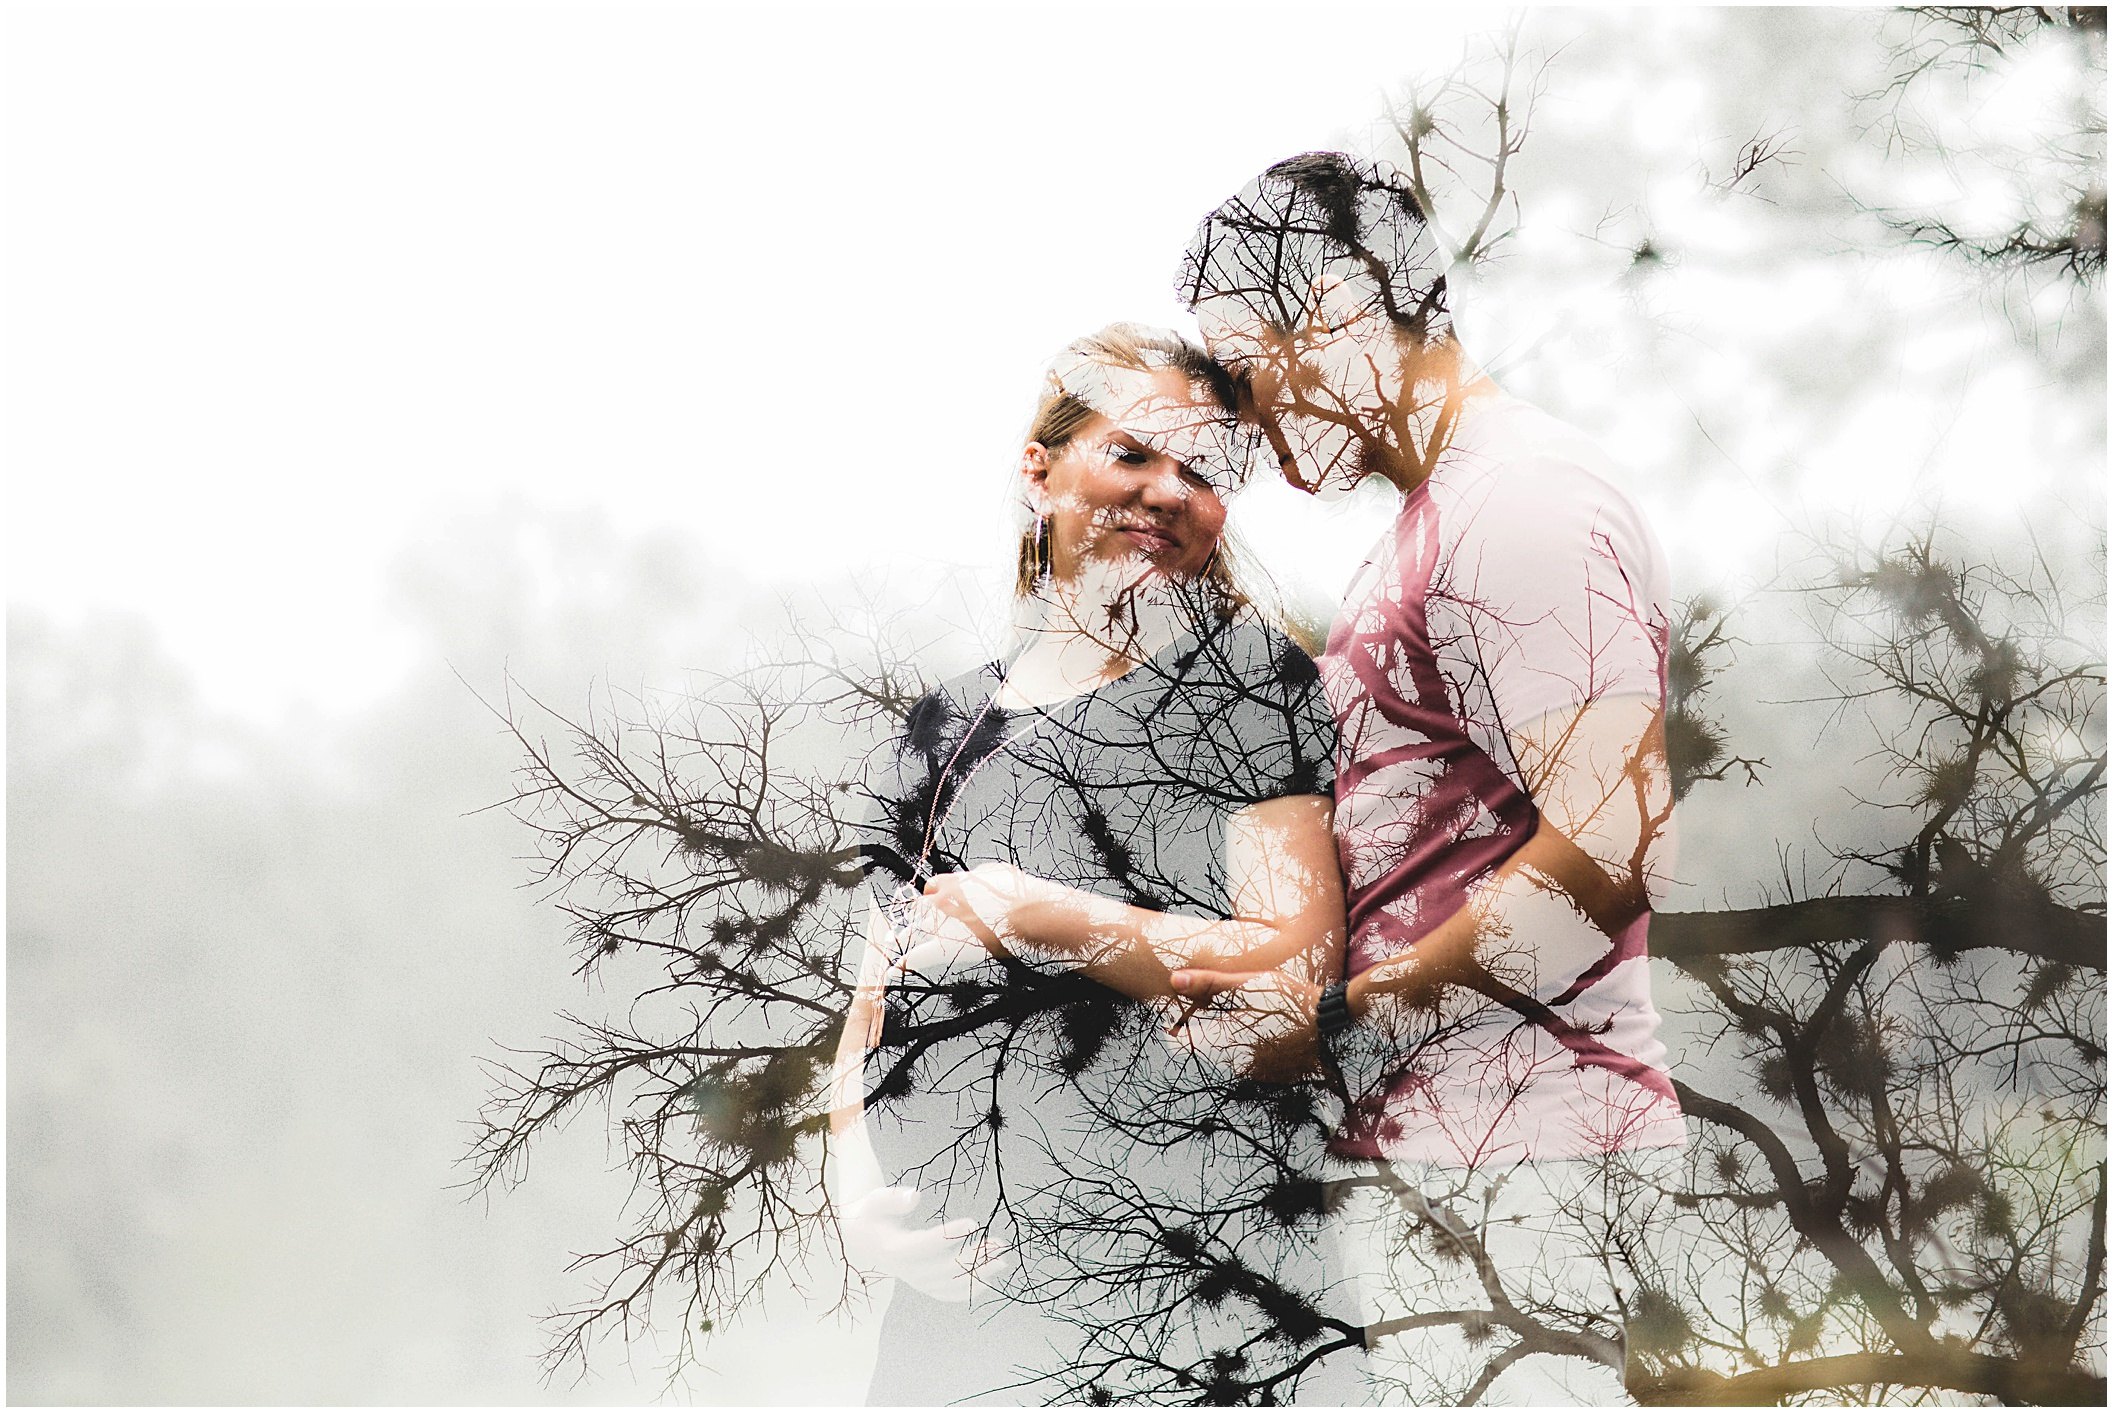 austin-texas-maternity-photography-artistic_0019.jpg